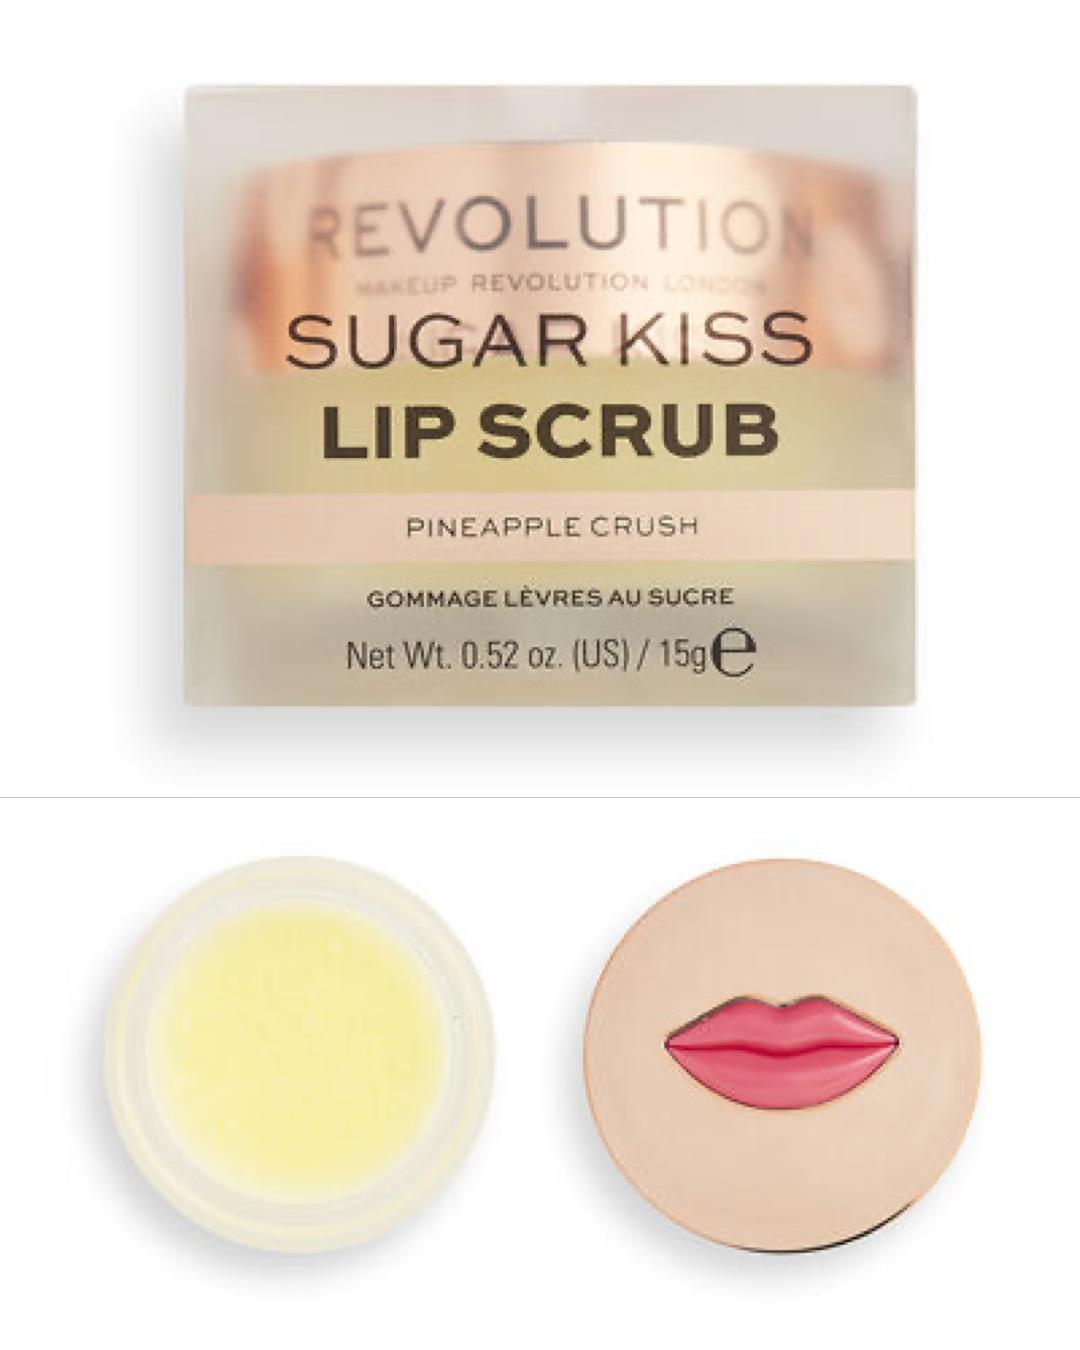 Revolution Sugar Kiss Lip Scrub